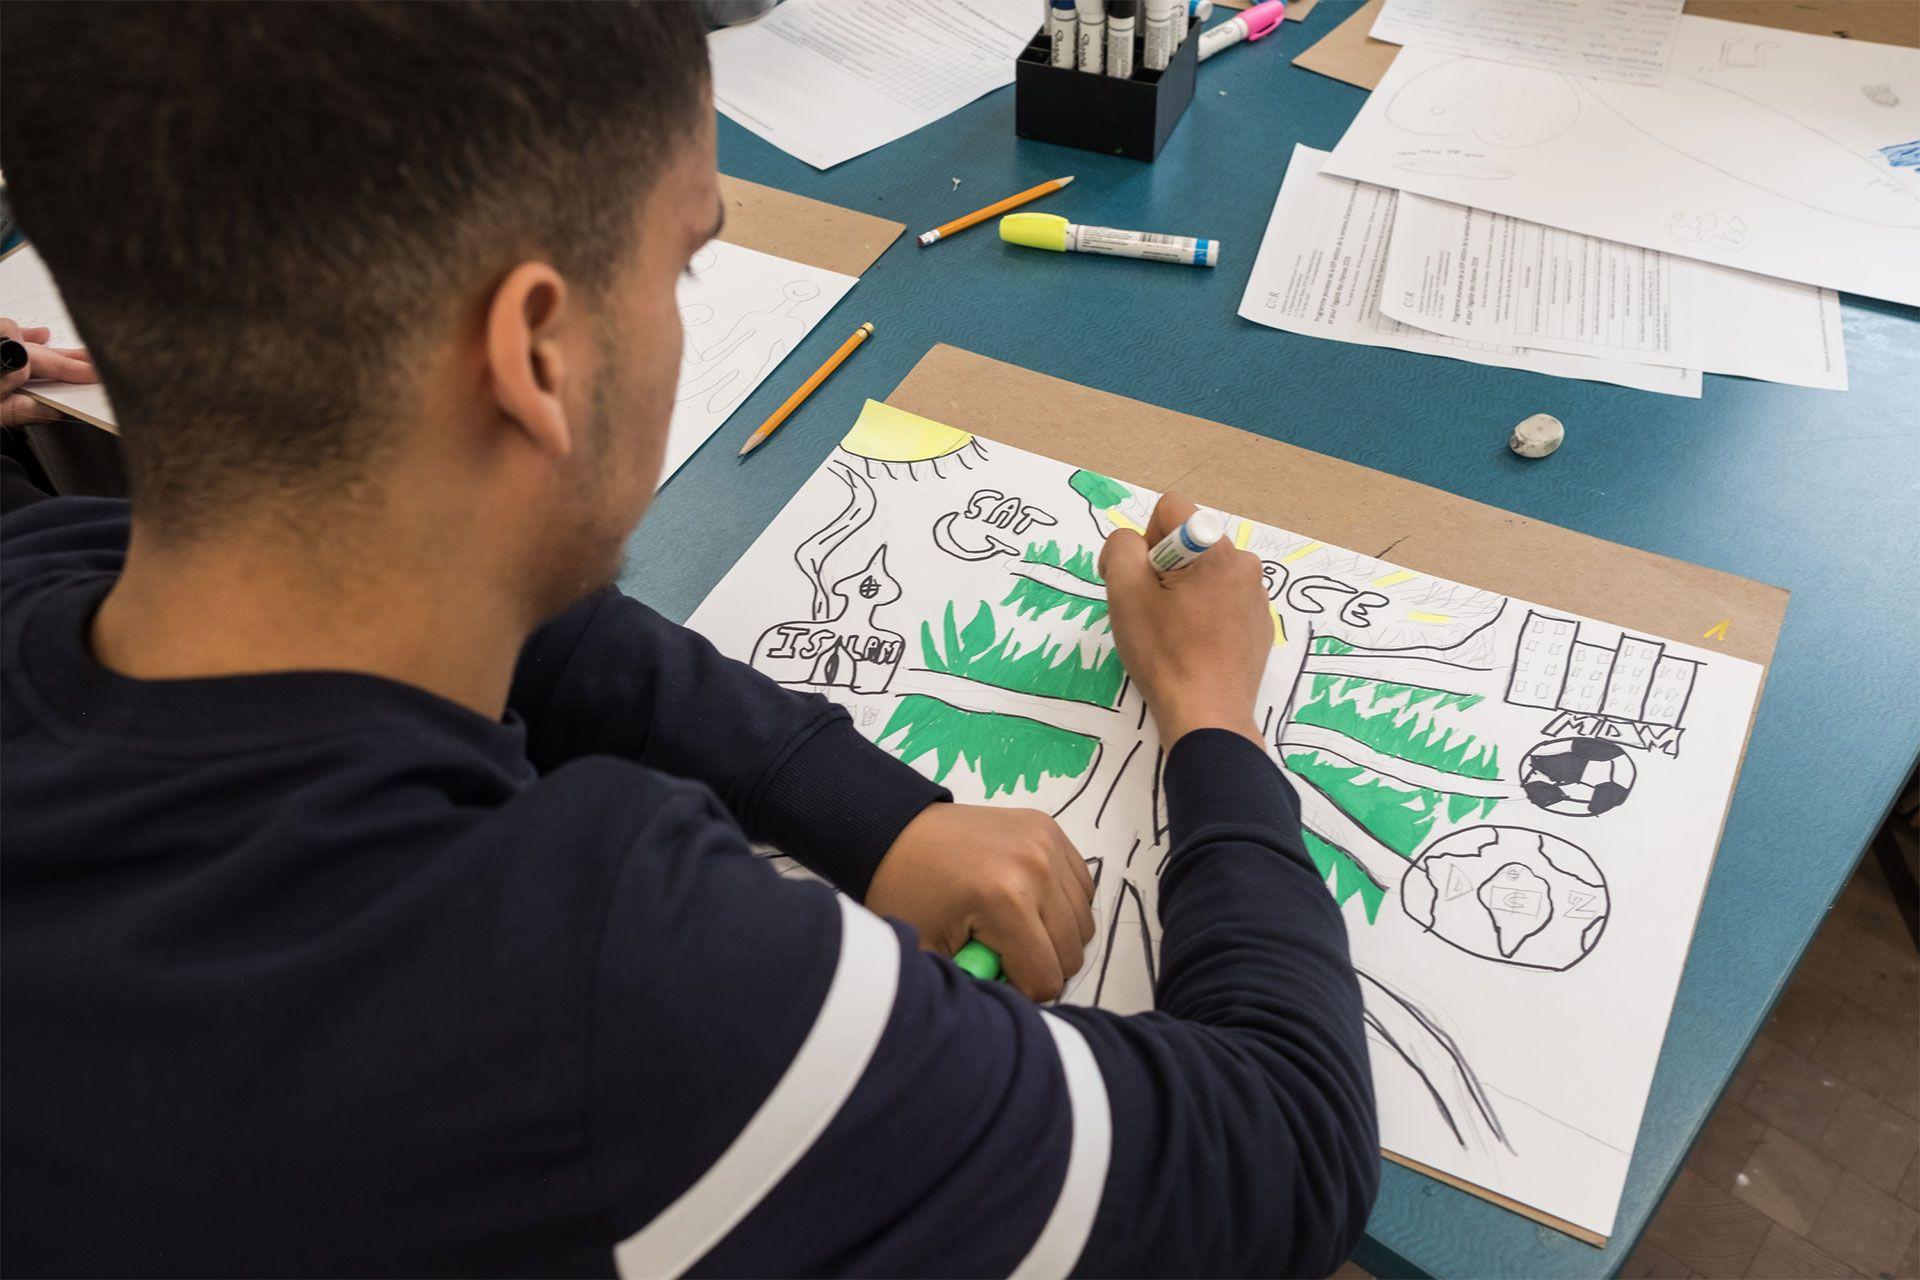 A teenager draws.